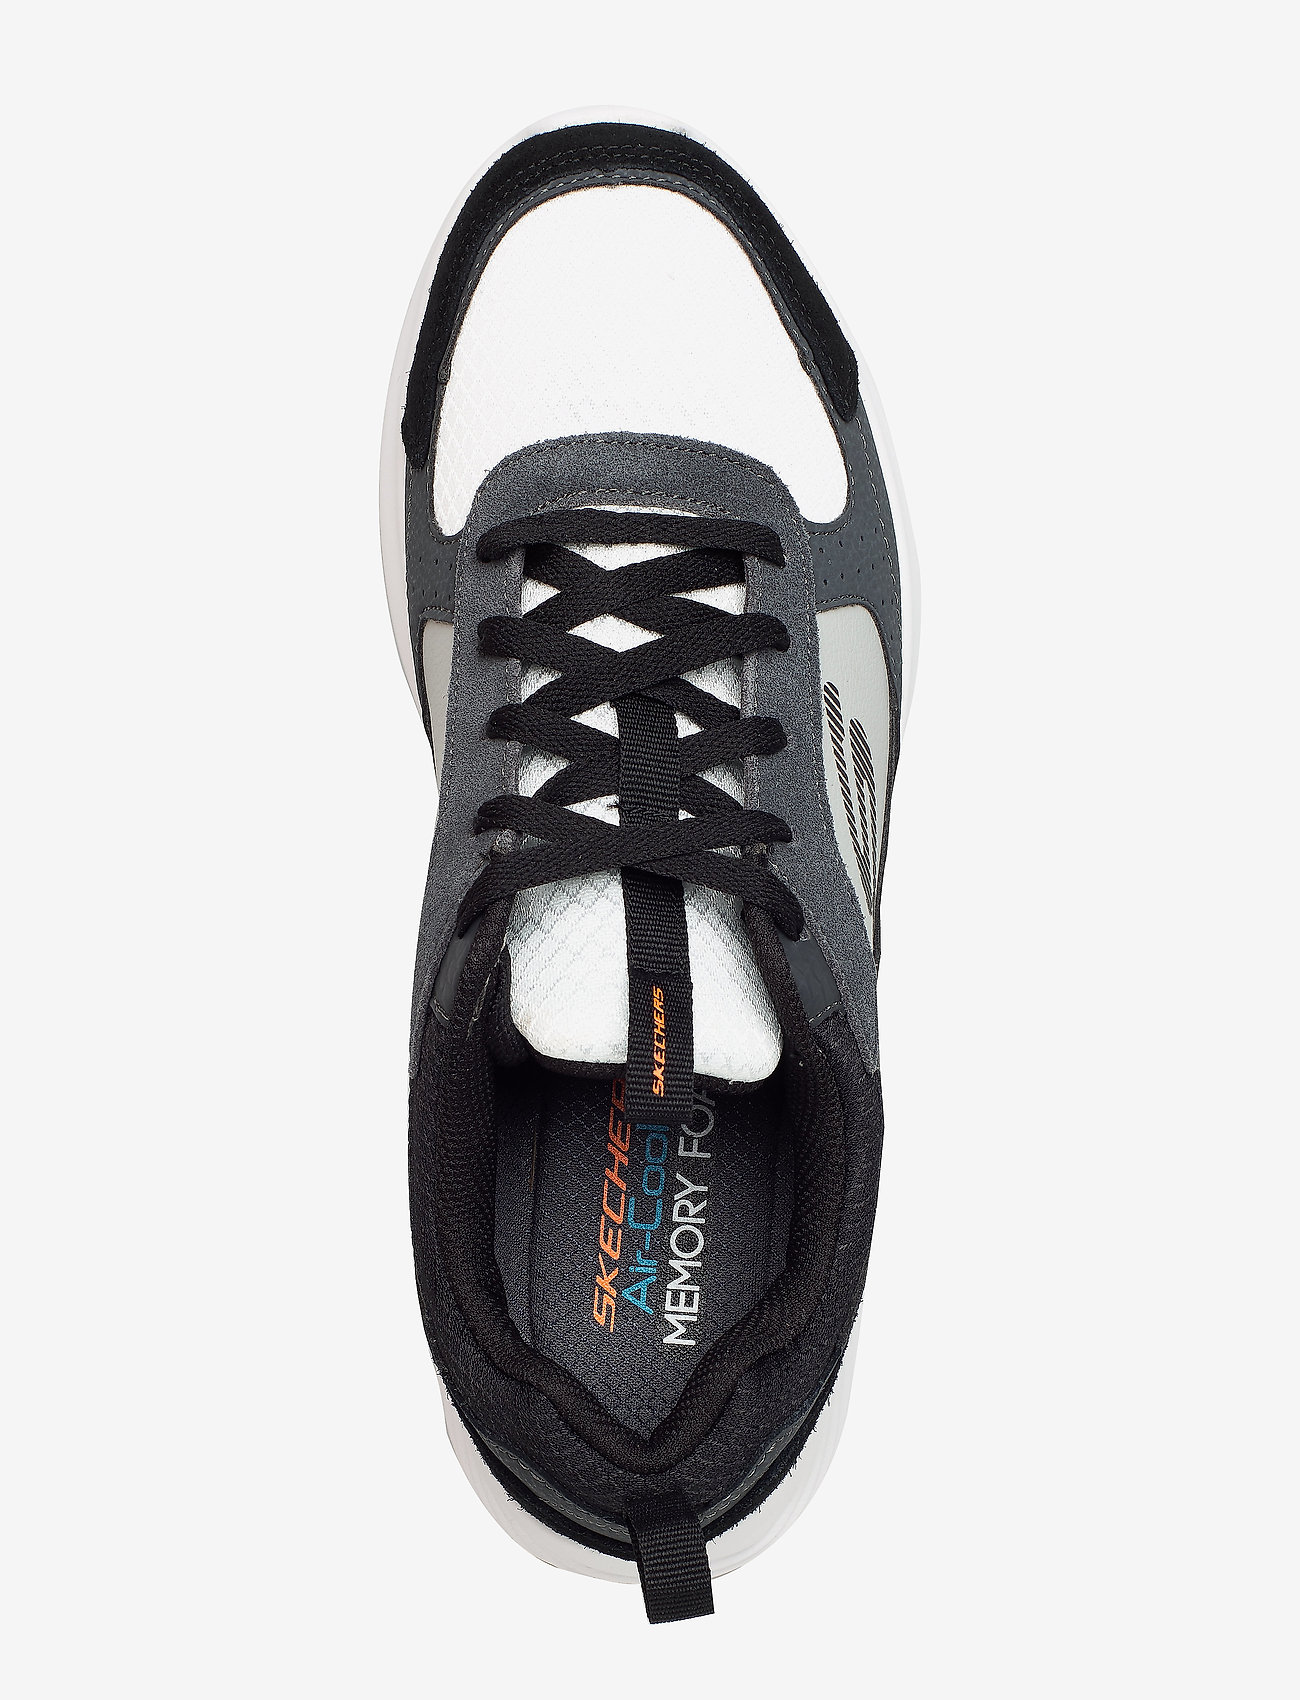 Mens Bounder (Ccbk Charcoal Black) - Skechers